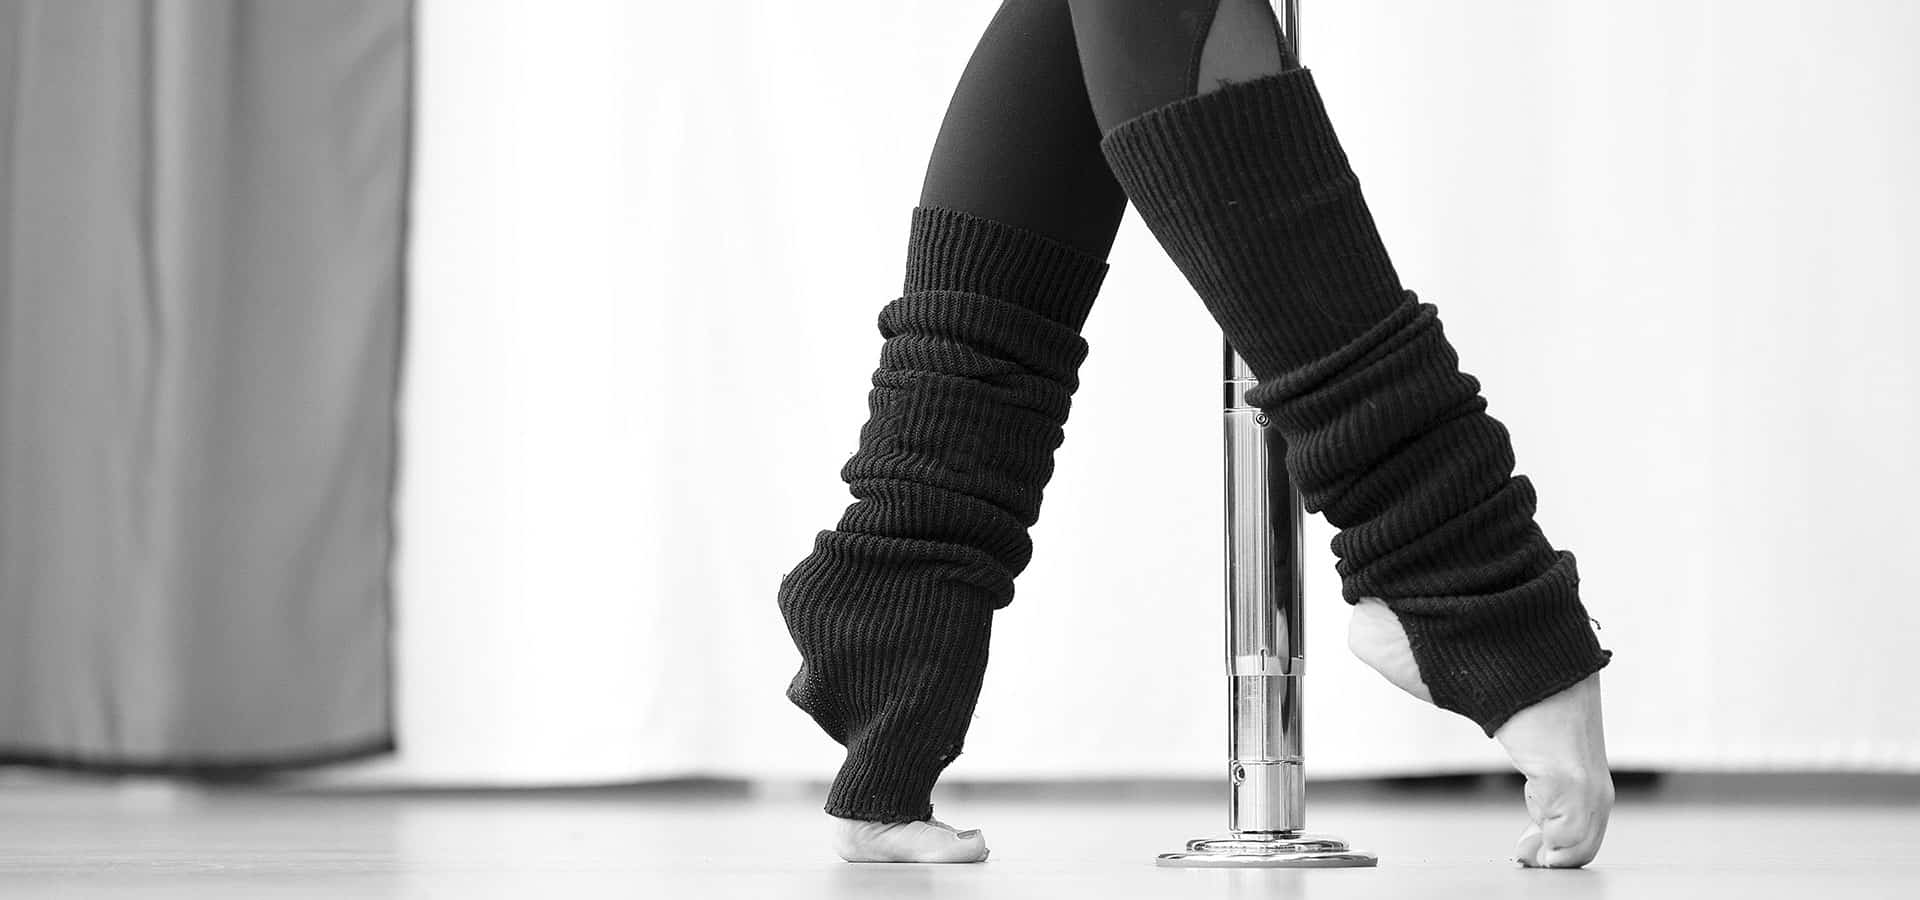 Poledance Kurs Zürich stretching